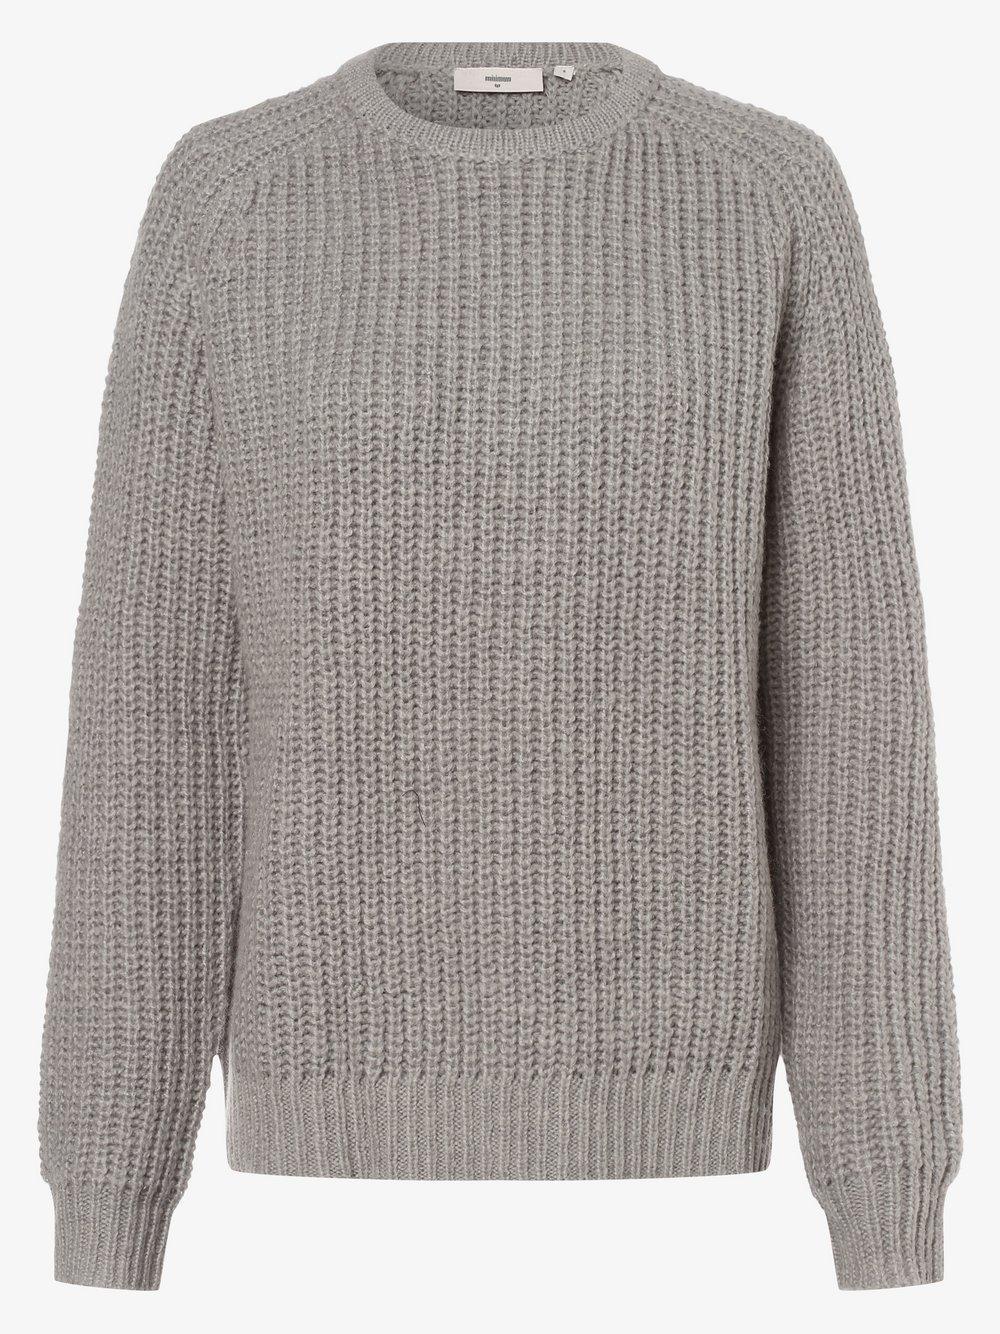 Minimum – Sweter damski – Emmeli, szary Van Graaf 484383-0001-09960